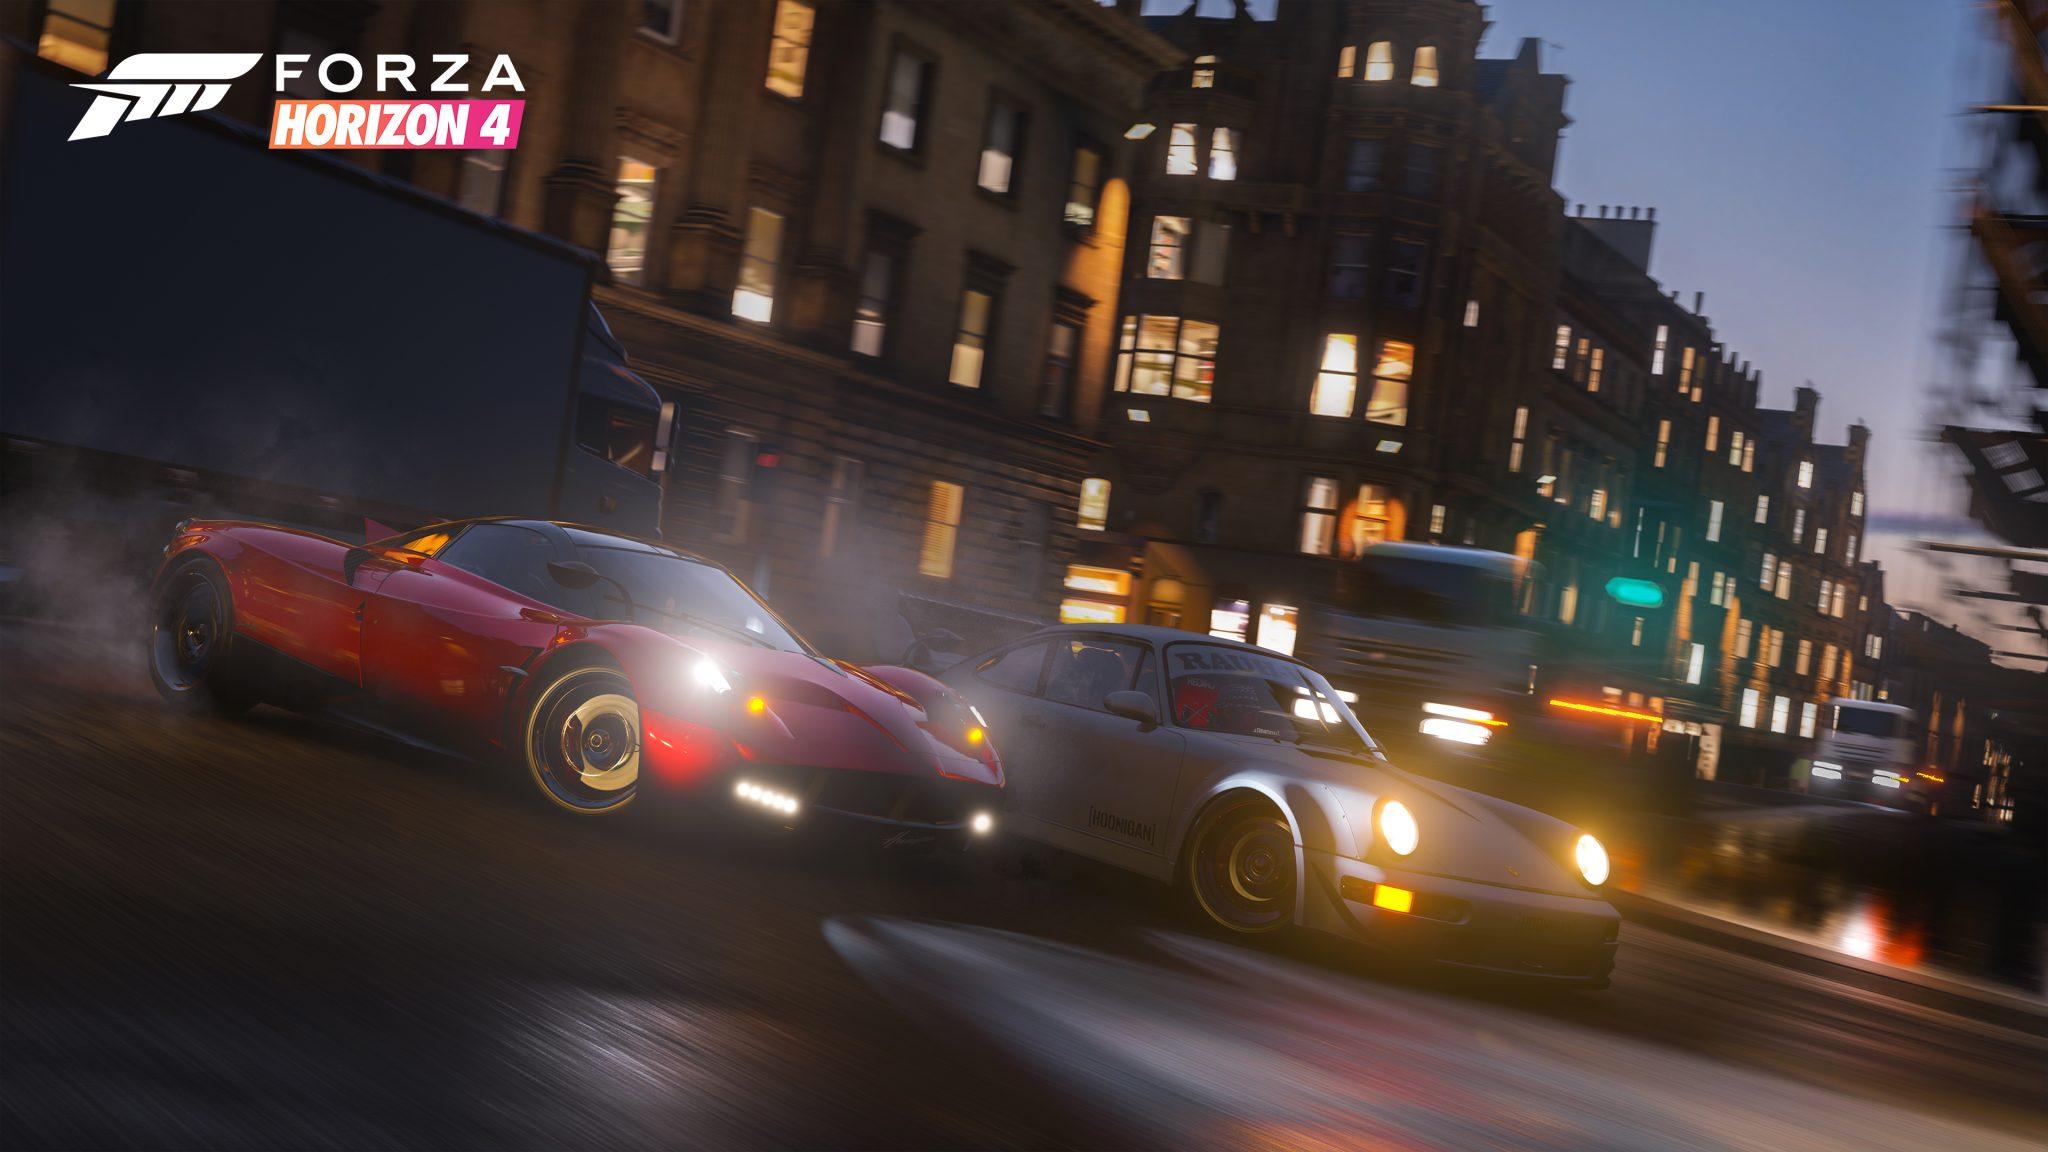 Forza Horizon 4 FH4 Xbox One X PC Ultimate Review Test Kritik Titel Nacht